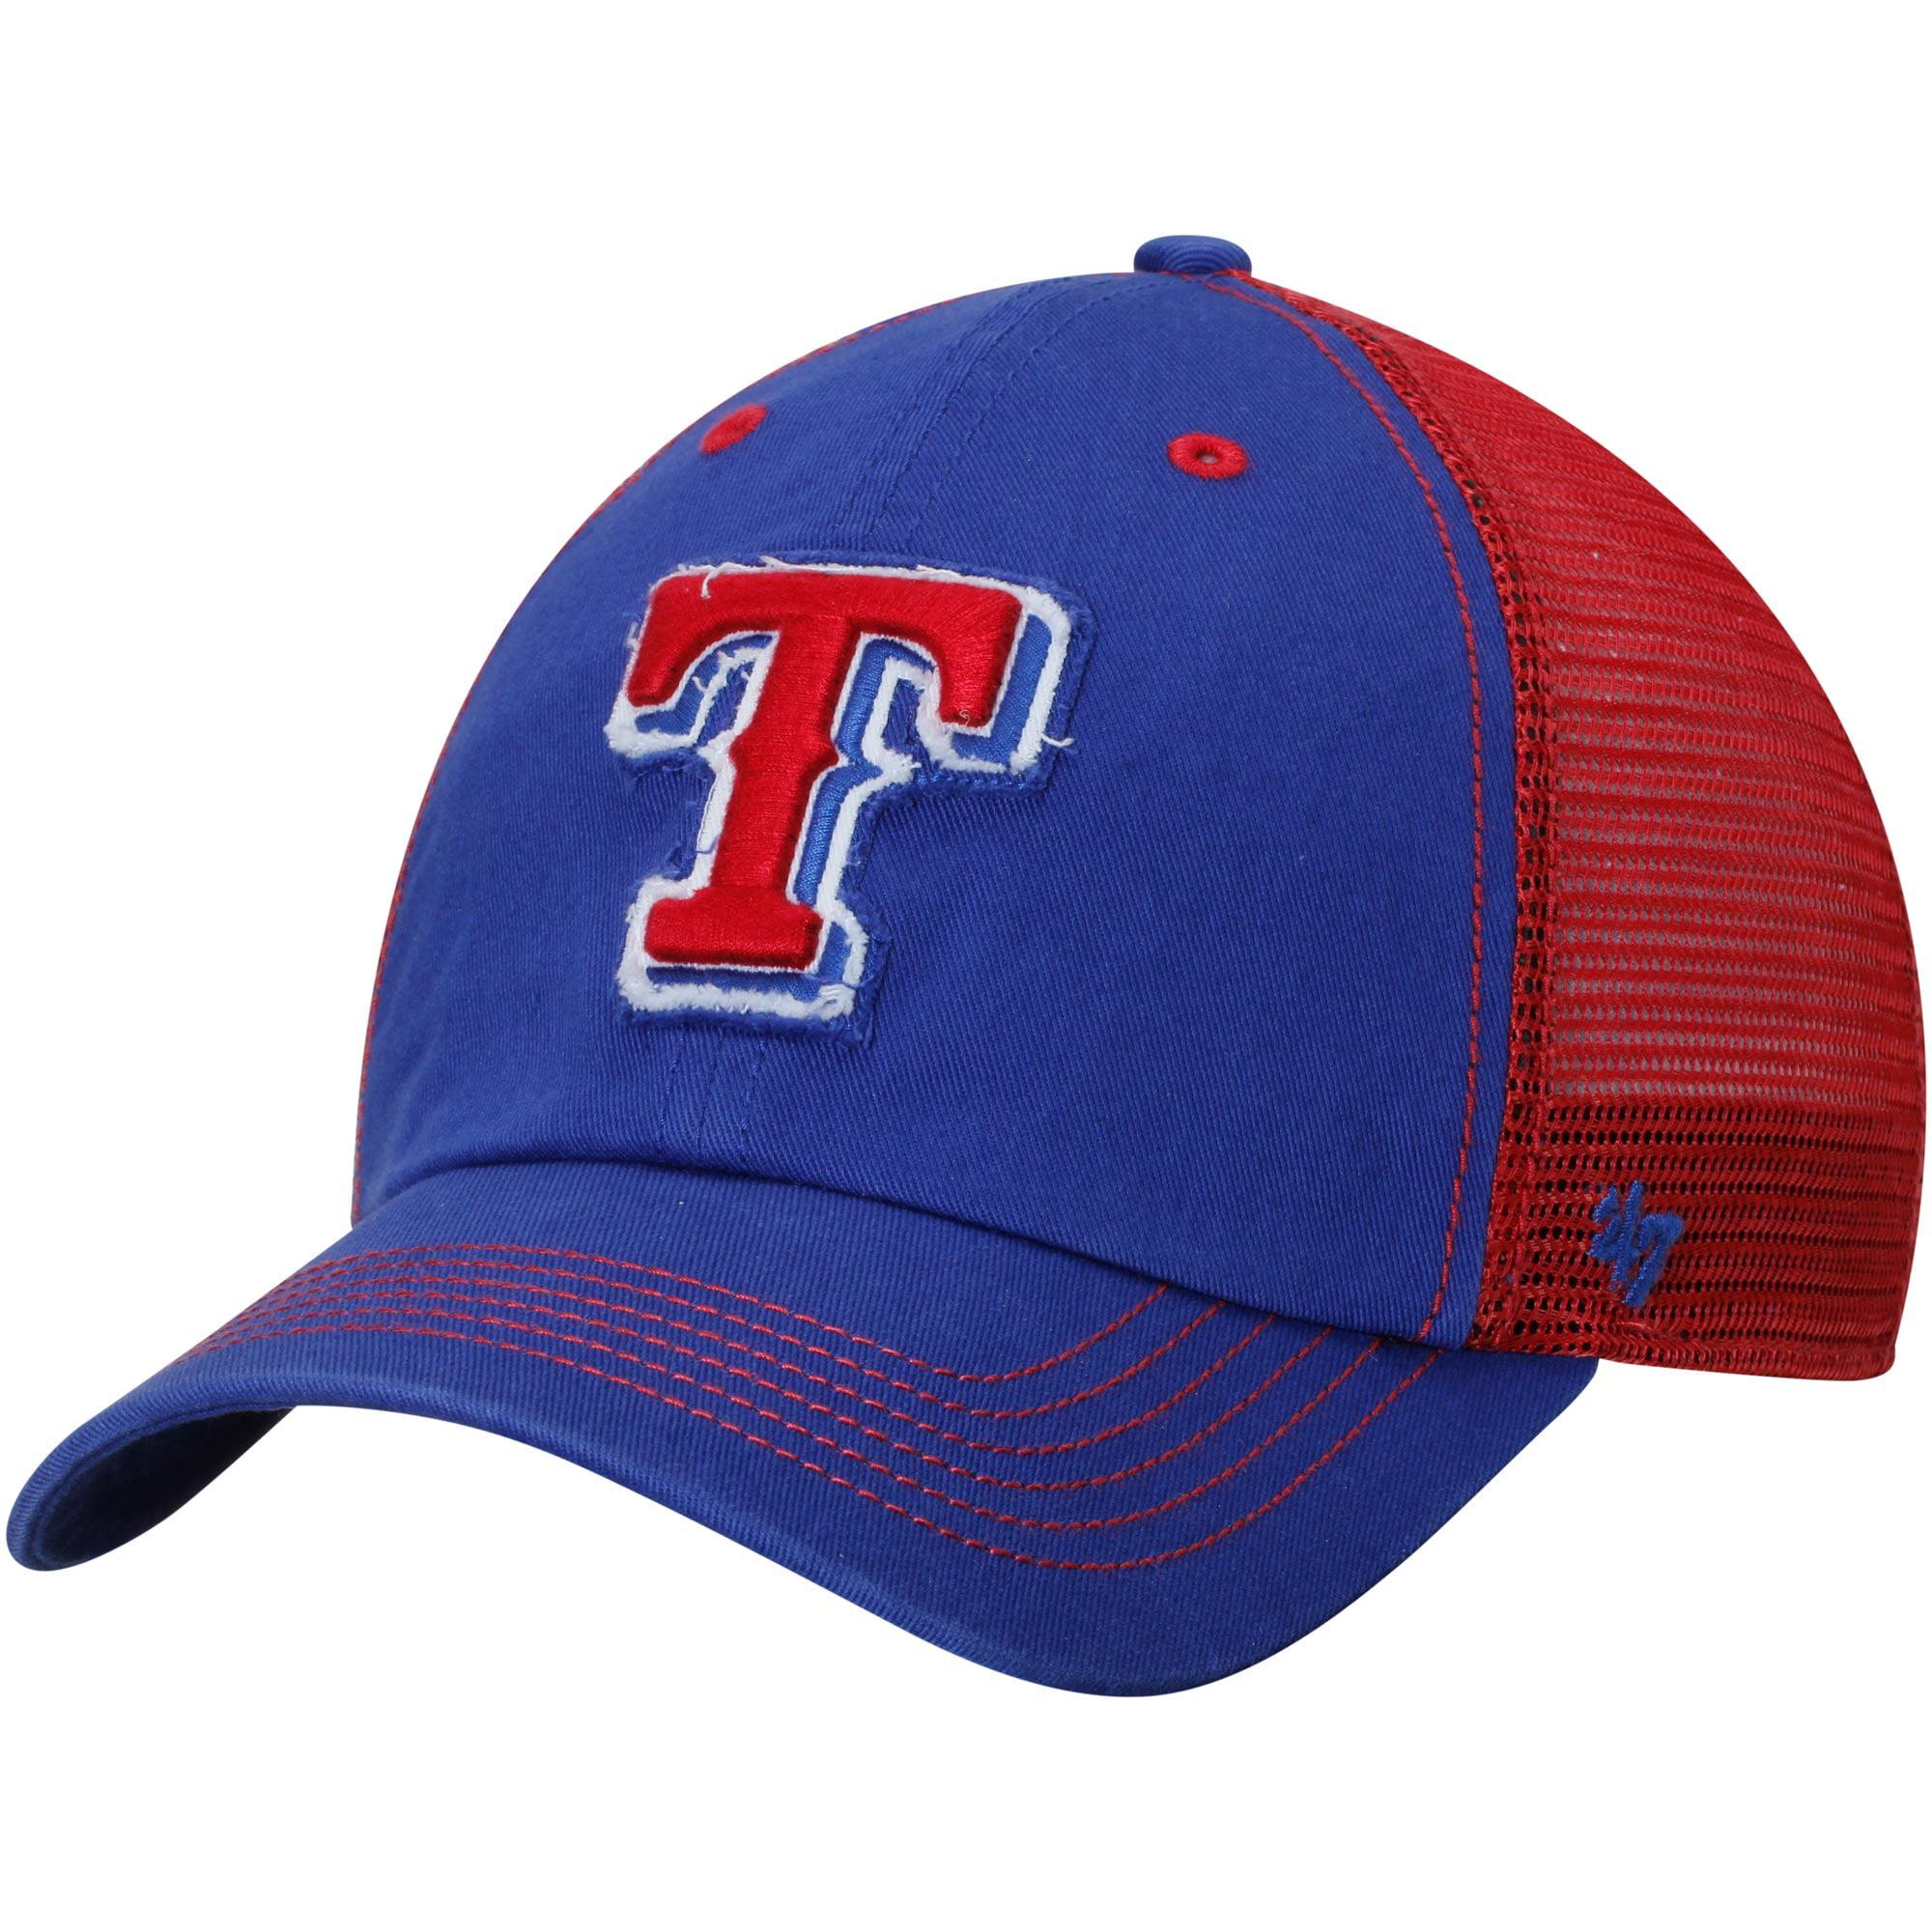 Texas Rangers '47 Brand Taylor Closer Flex Hat - White/Royal Blue